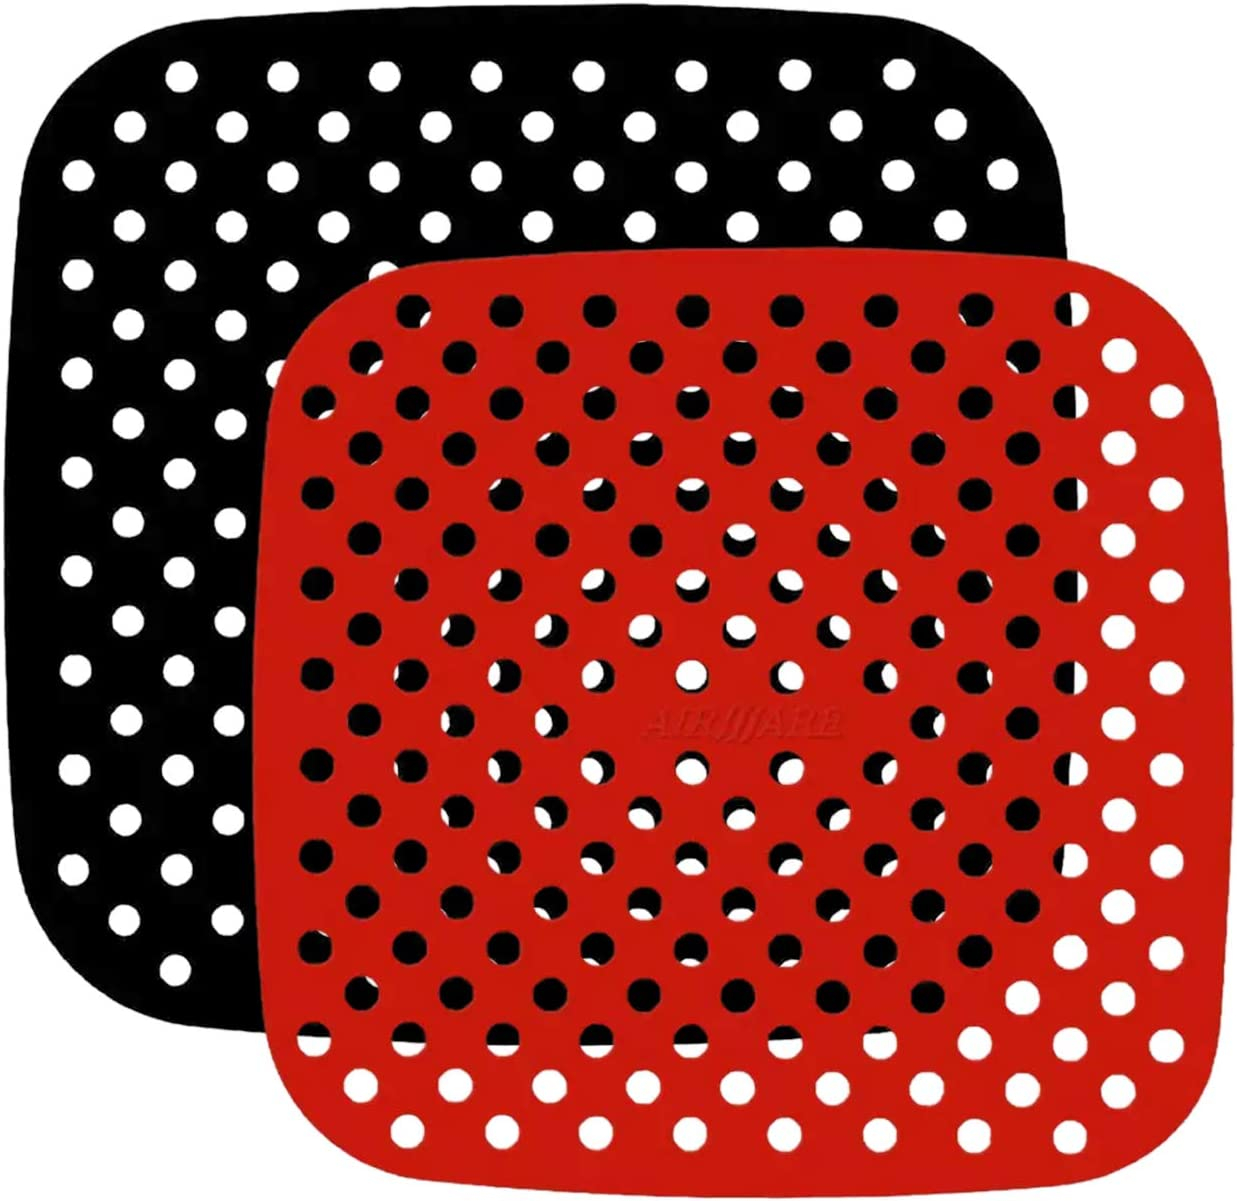 2 tamaños Almohadilla de freidora de aire, almohadillas de silicona, revestimientos reutilizables para freidora de aire para microondas, horno, bandeja para freidora de aire, cesta de vapor